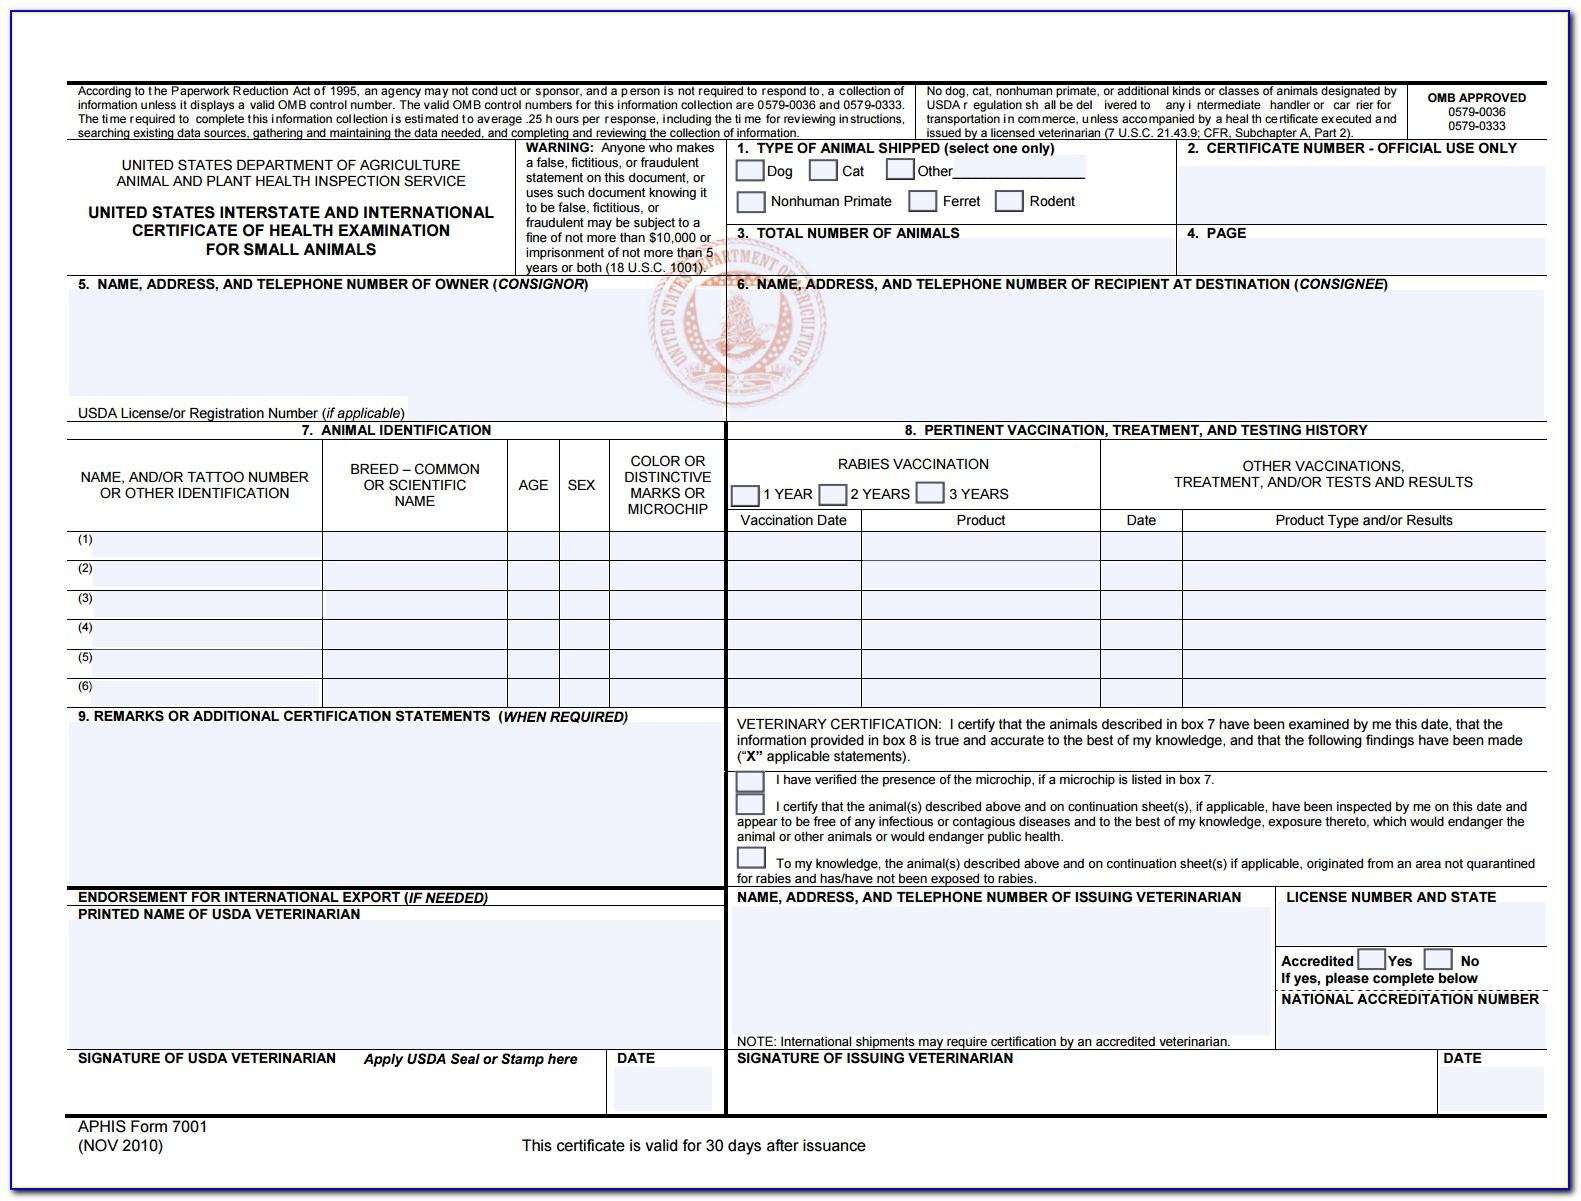 Florida Certification Of Immunization Dh 680 Form (florida State Statute 1003.22)